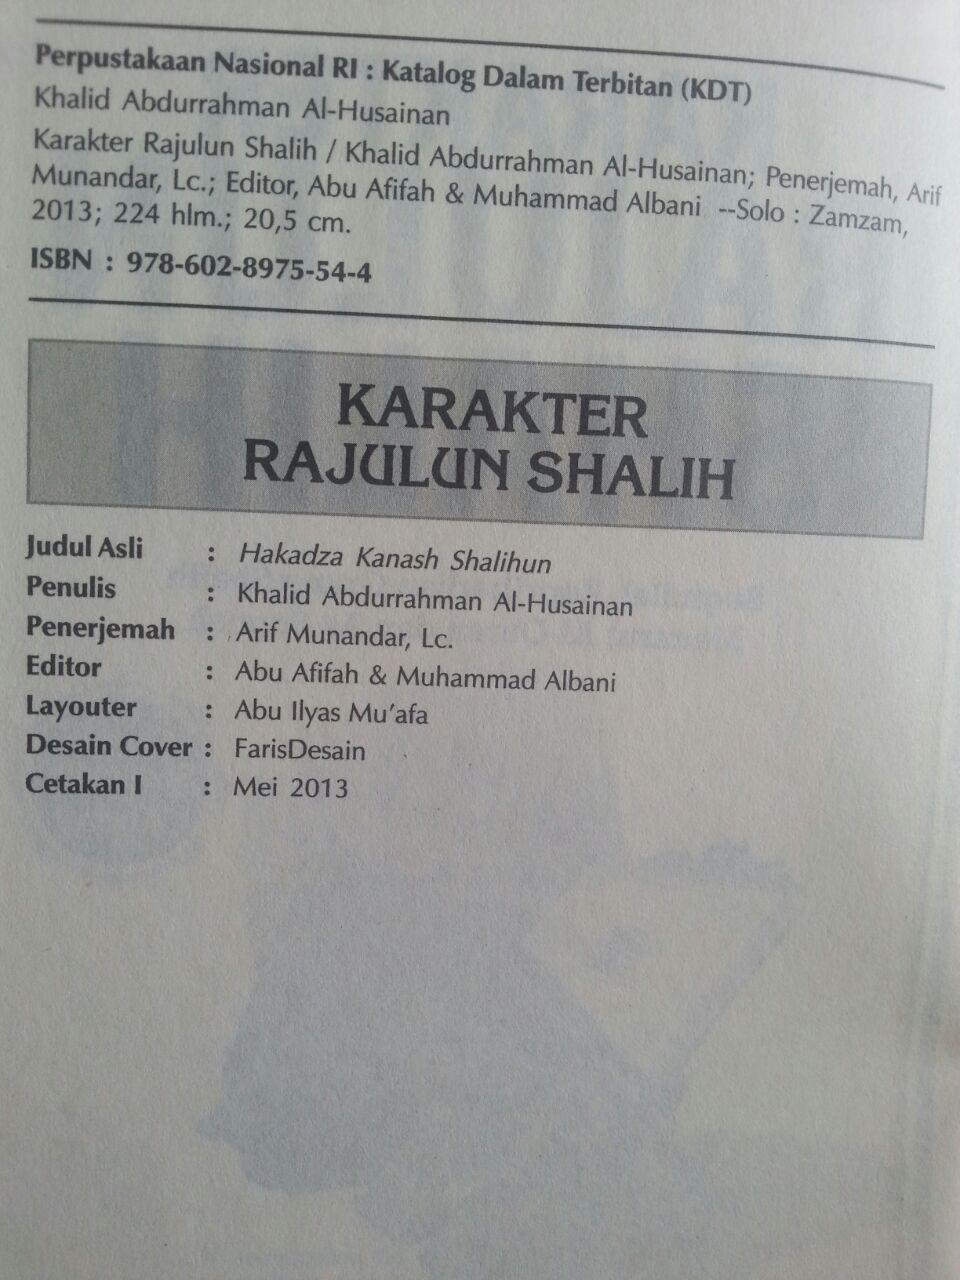 Buku Karakter Rajulun Shalih Kepribadian Menurut Quran Sunnah isi